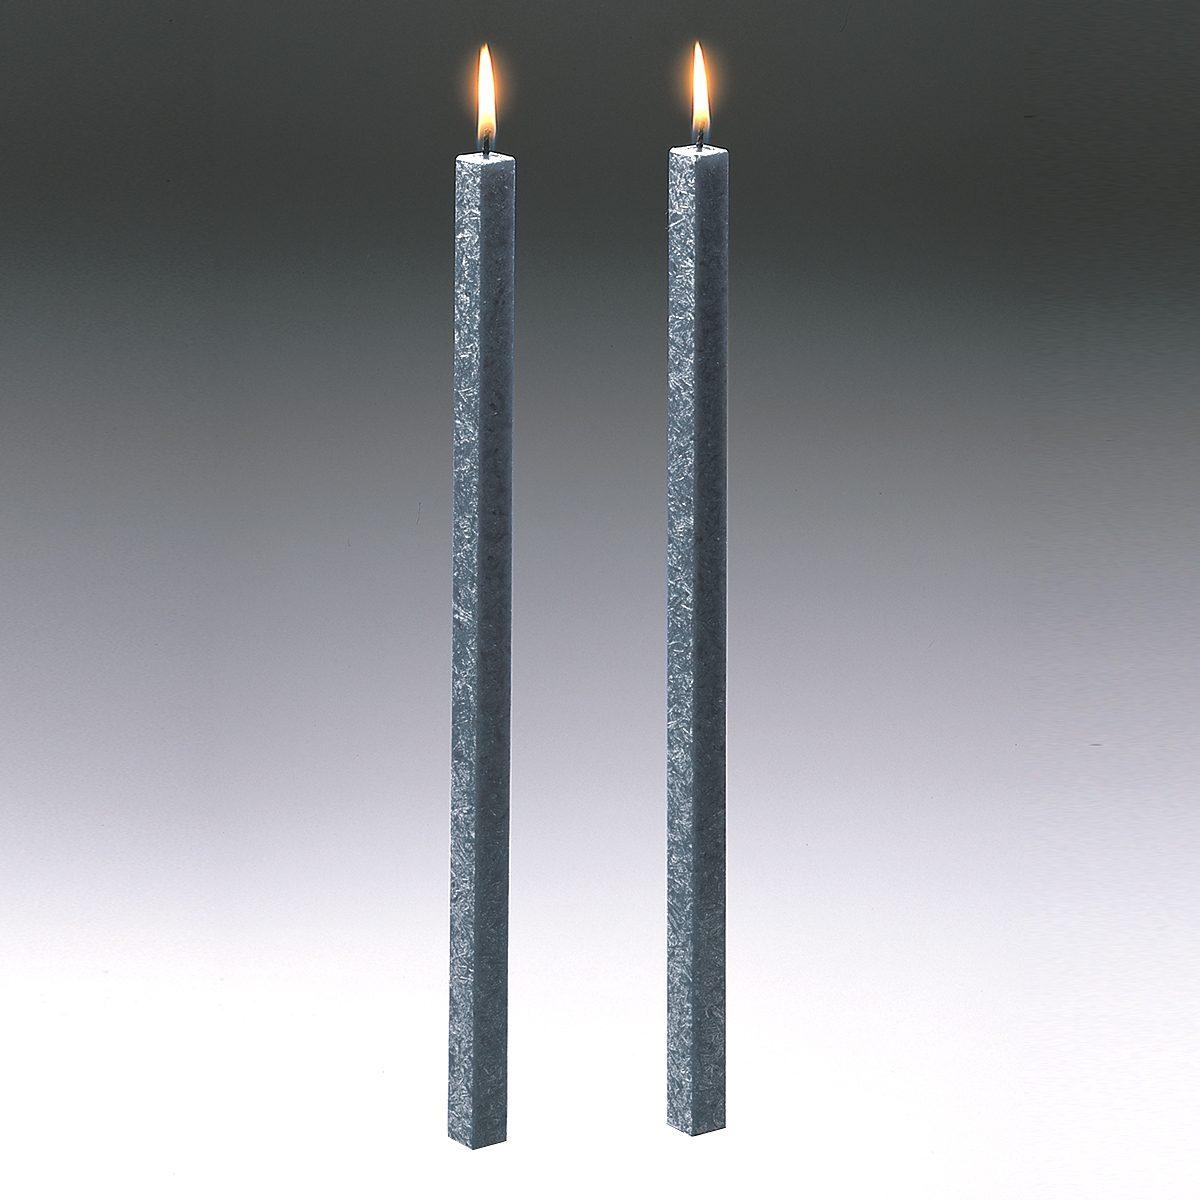 Amabiente Amabiente Kerze CLASSIC stein 40cm - 2er Set